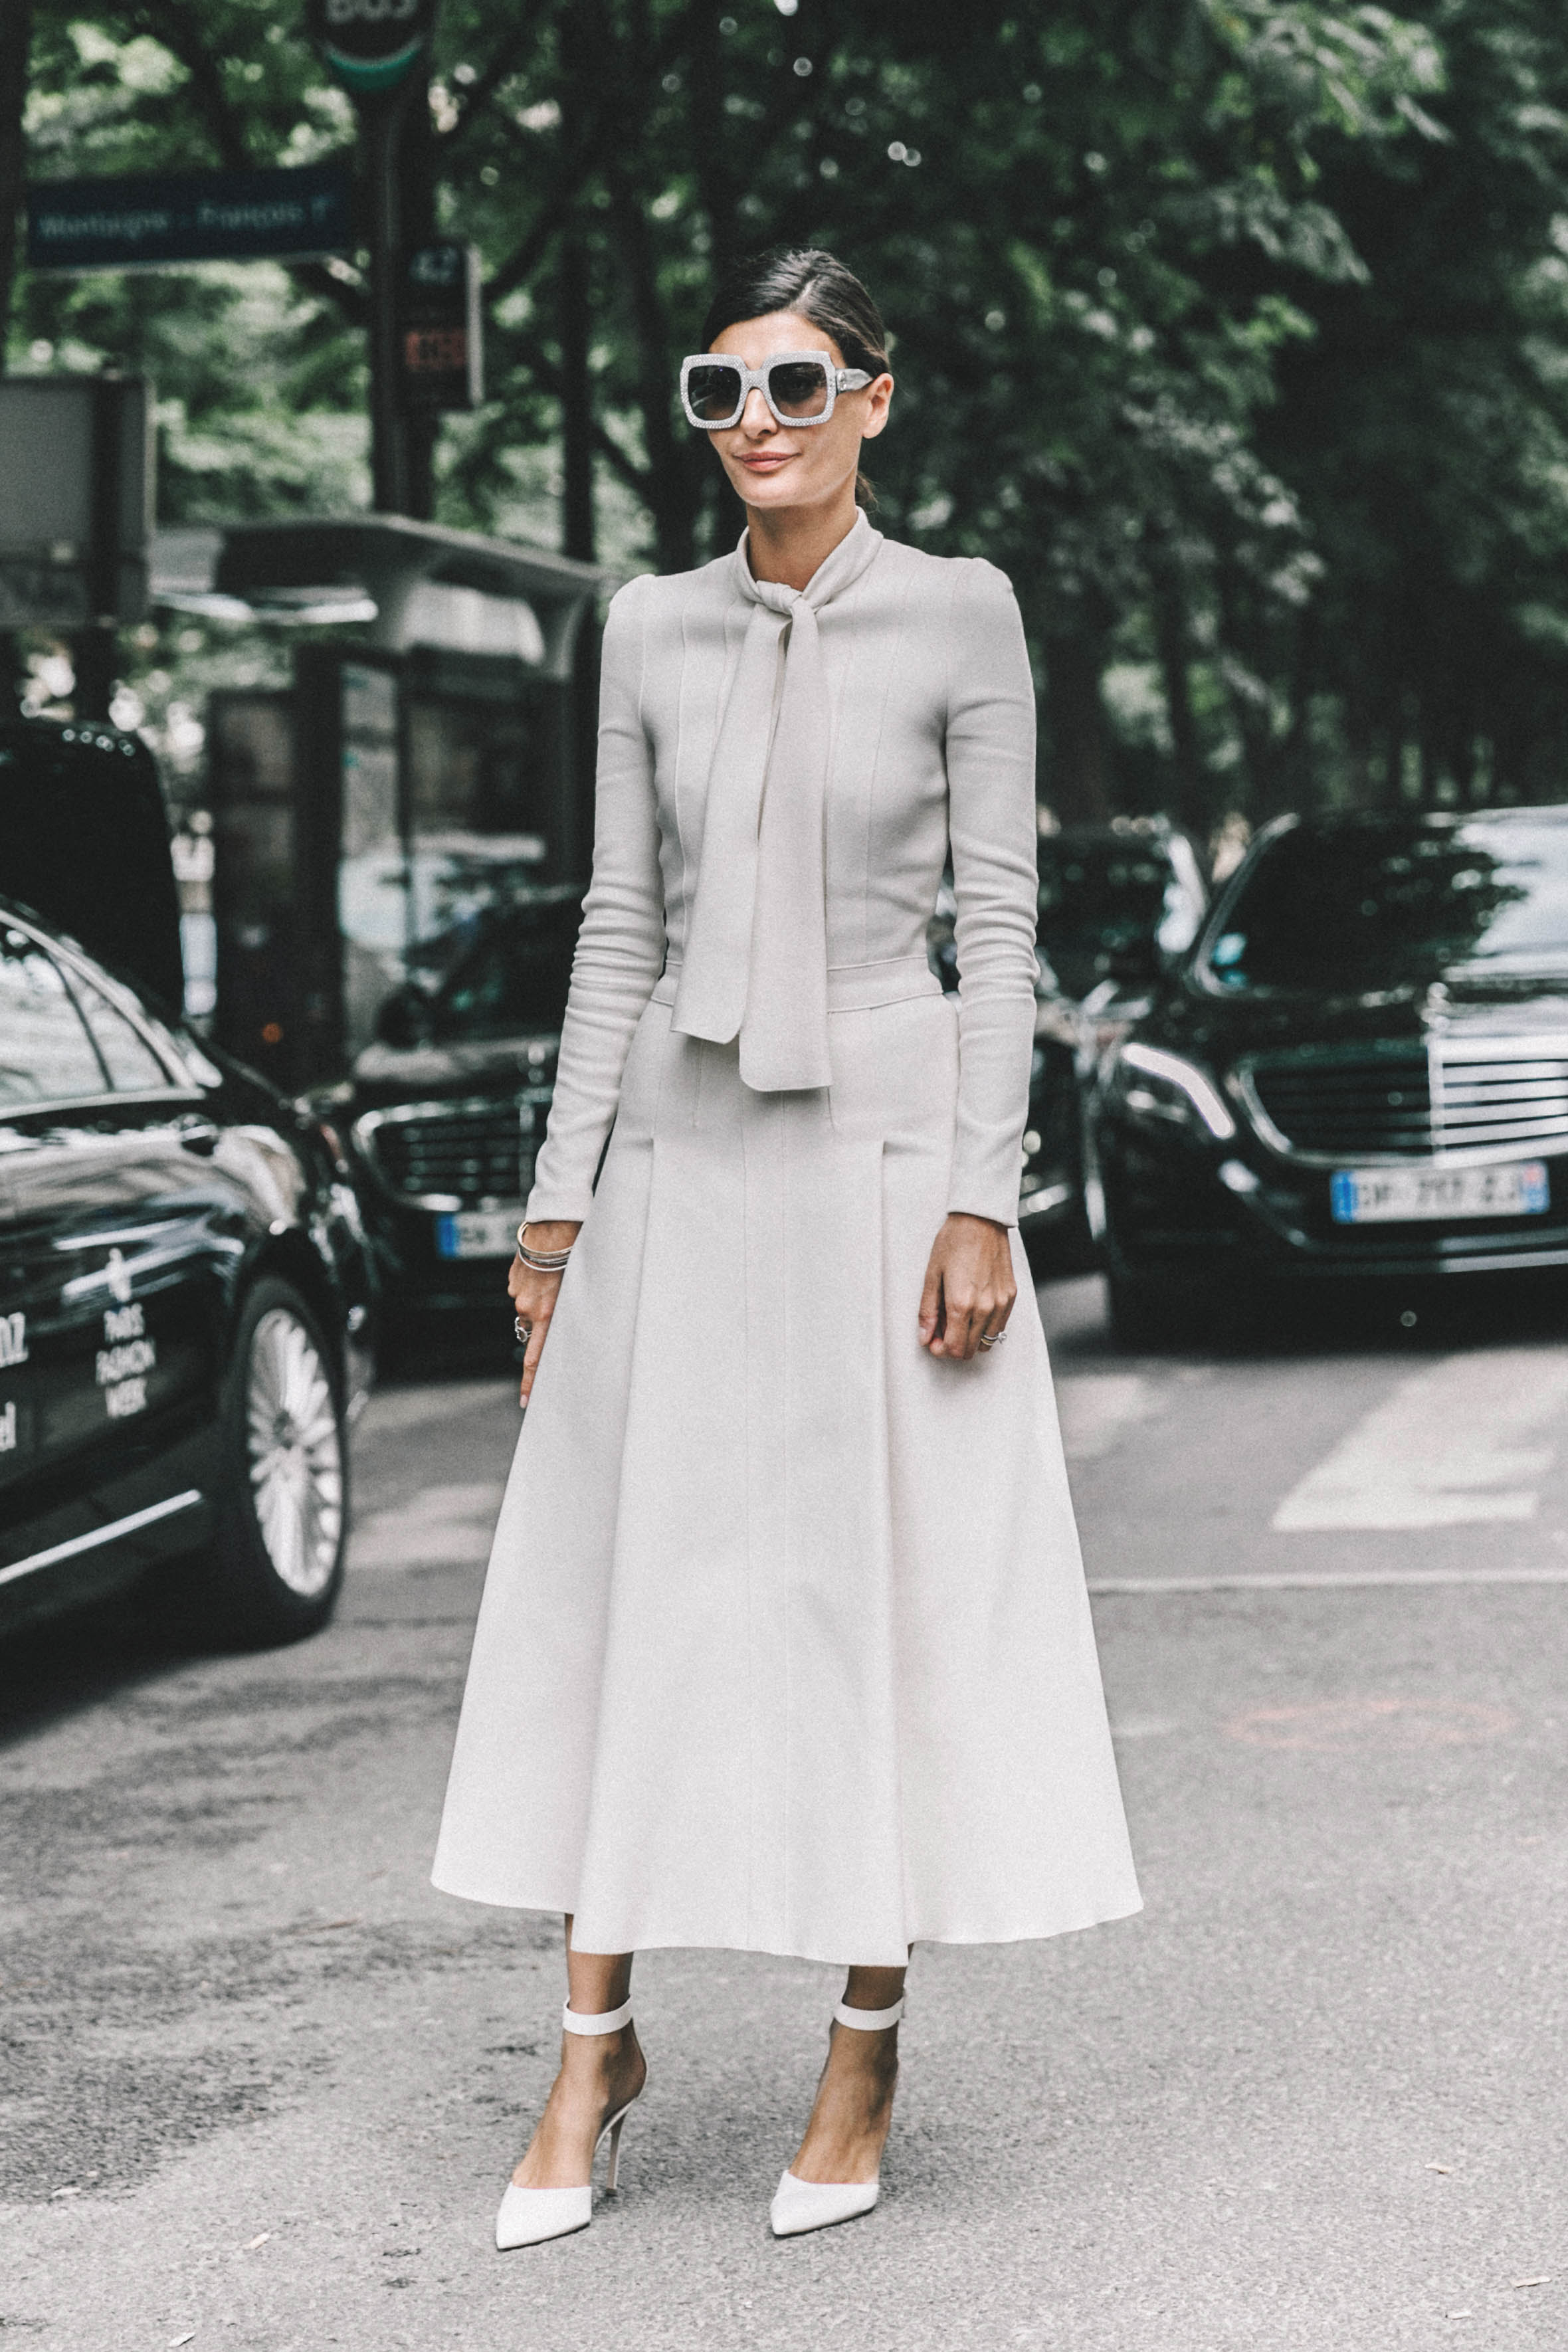 paris_couture_fashion_week-collage_vintage-104